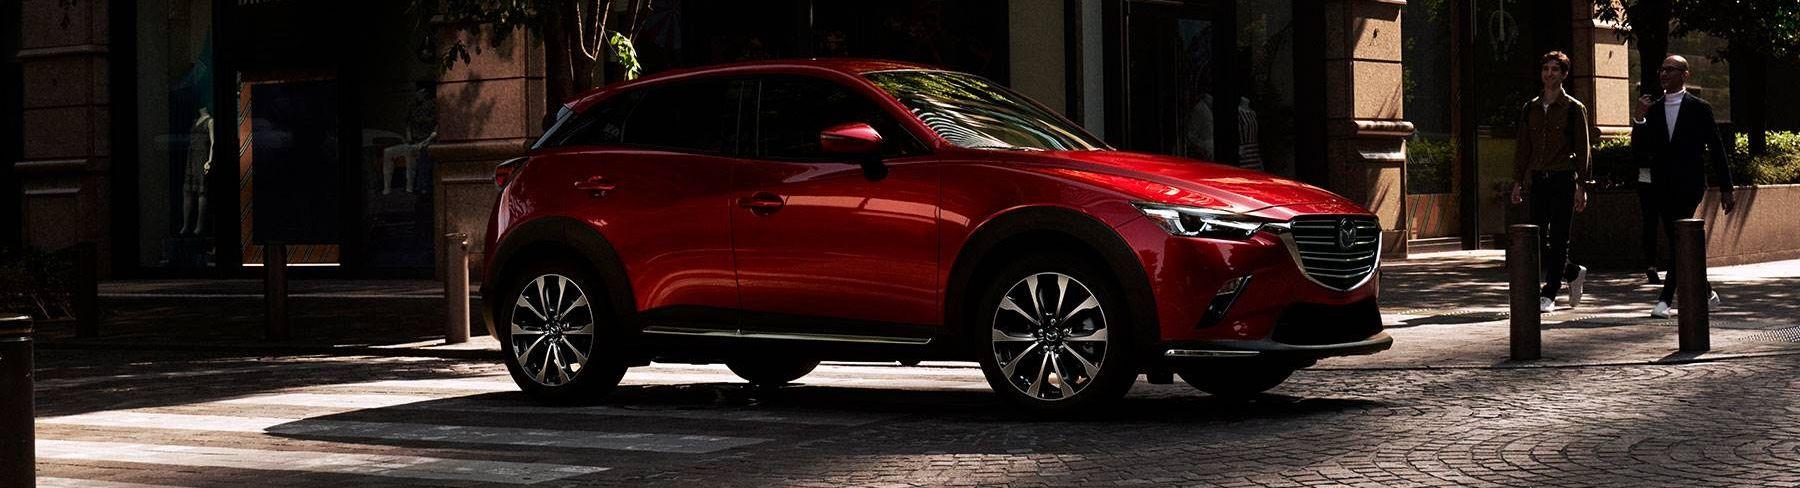 2019 Mazda CX-3 for Sale near Scottsdale, AZ